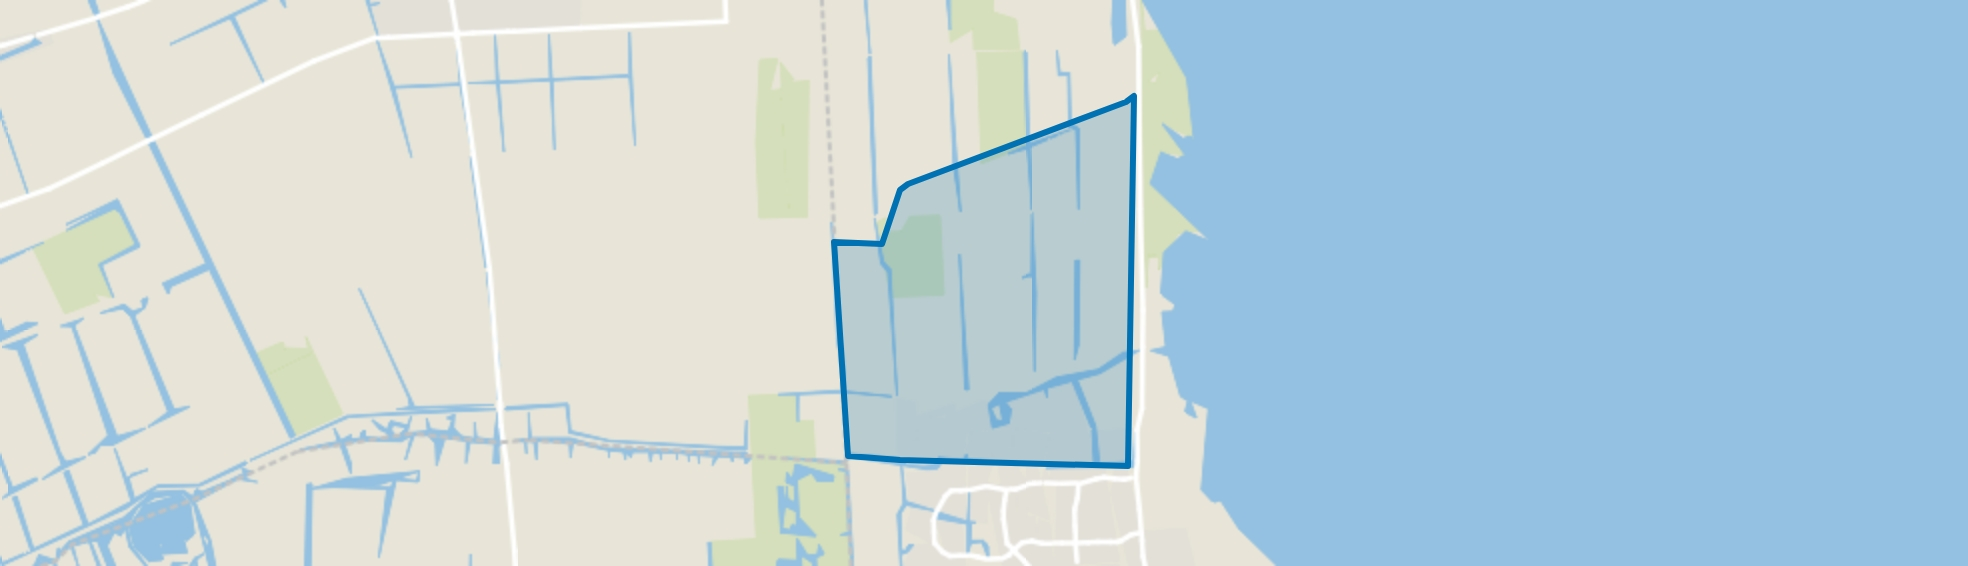 Kadijken, Enkhuizen map